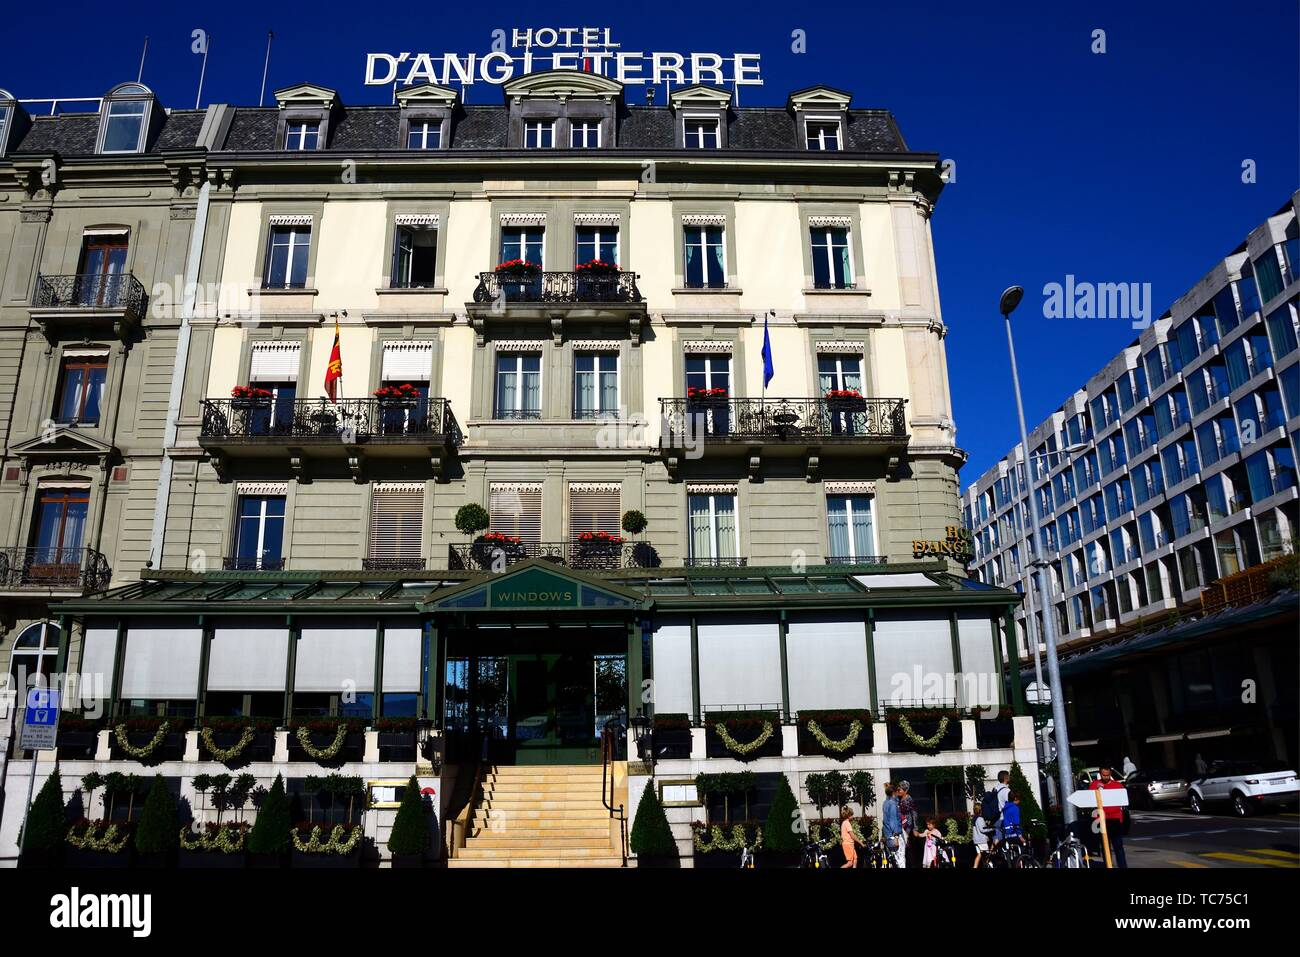 Quai du Mont -Blanc along Lake Geneva, Five-star luxury historic hotel Hôtel d'Angleterre, Geneva, Switzerland, Europe - Stock Image